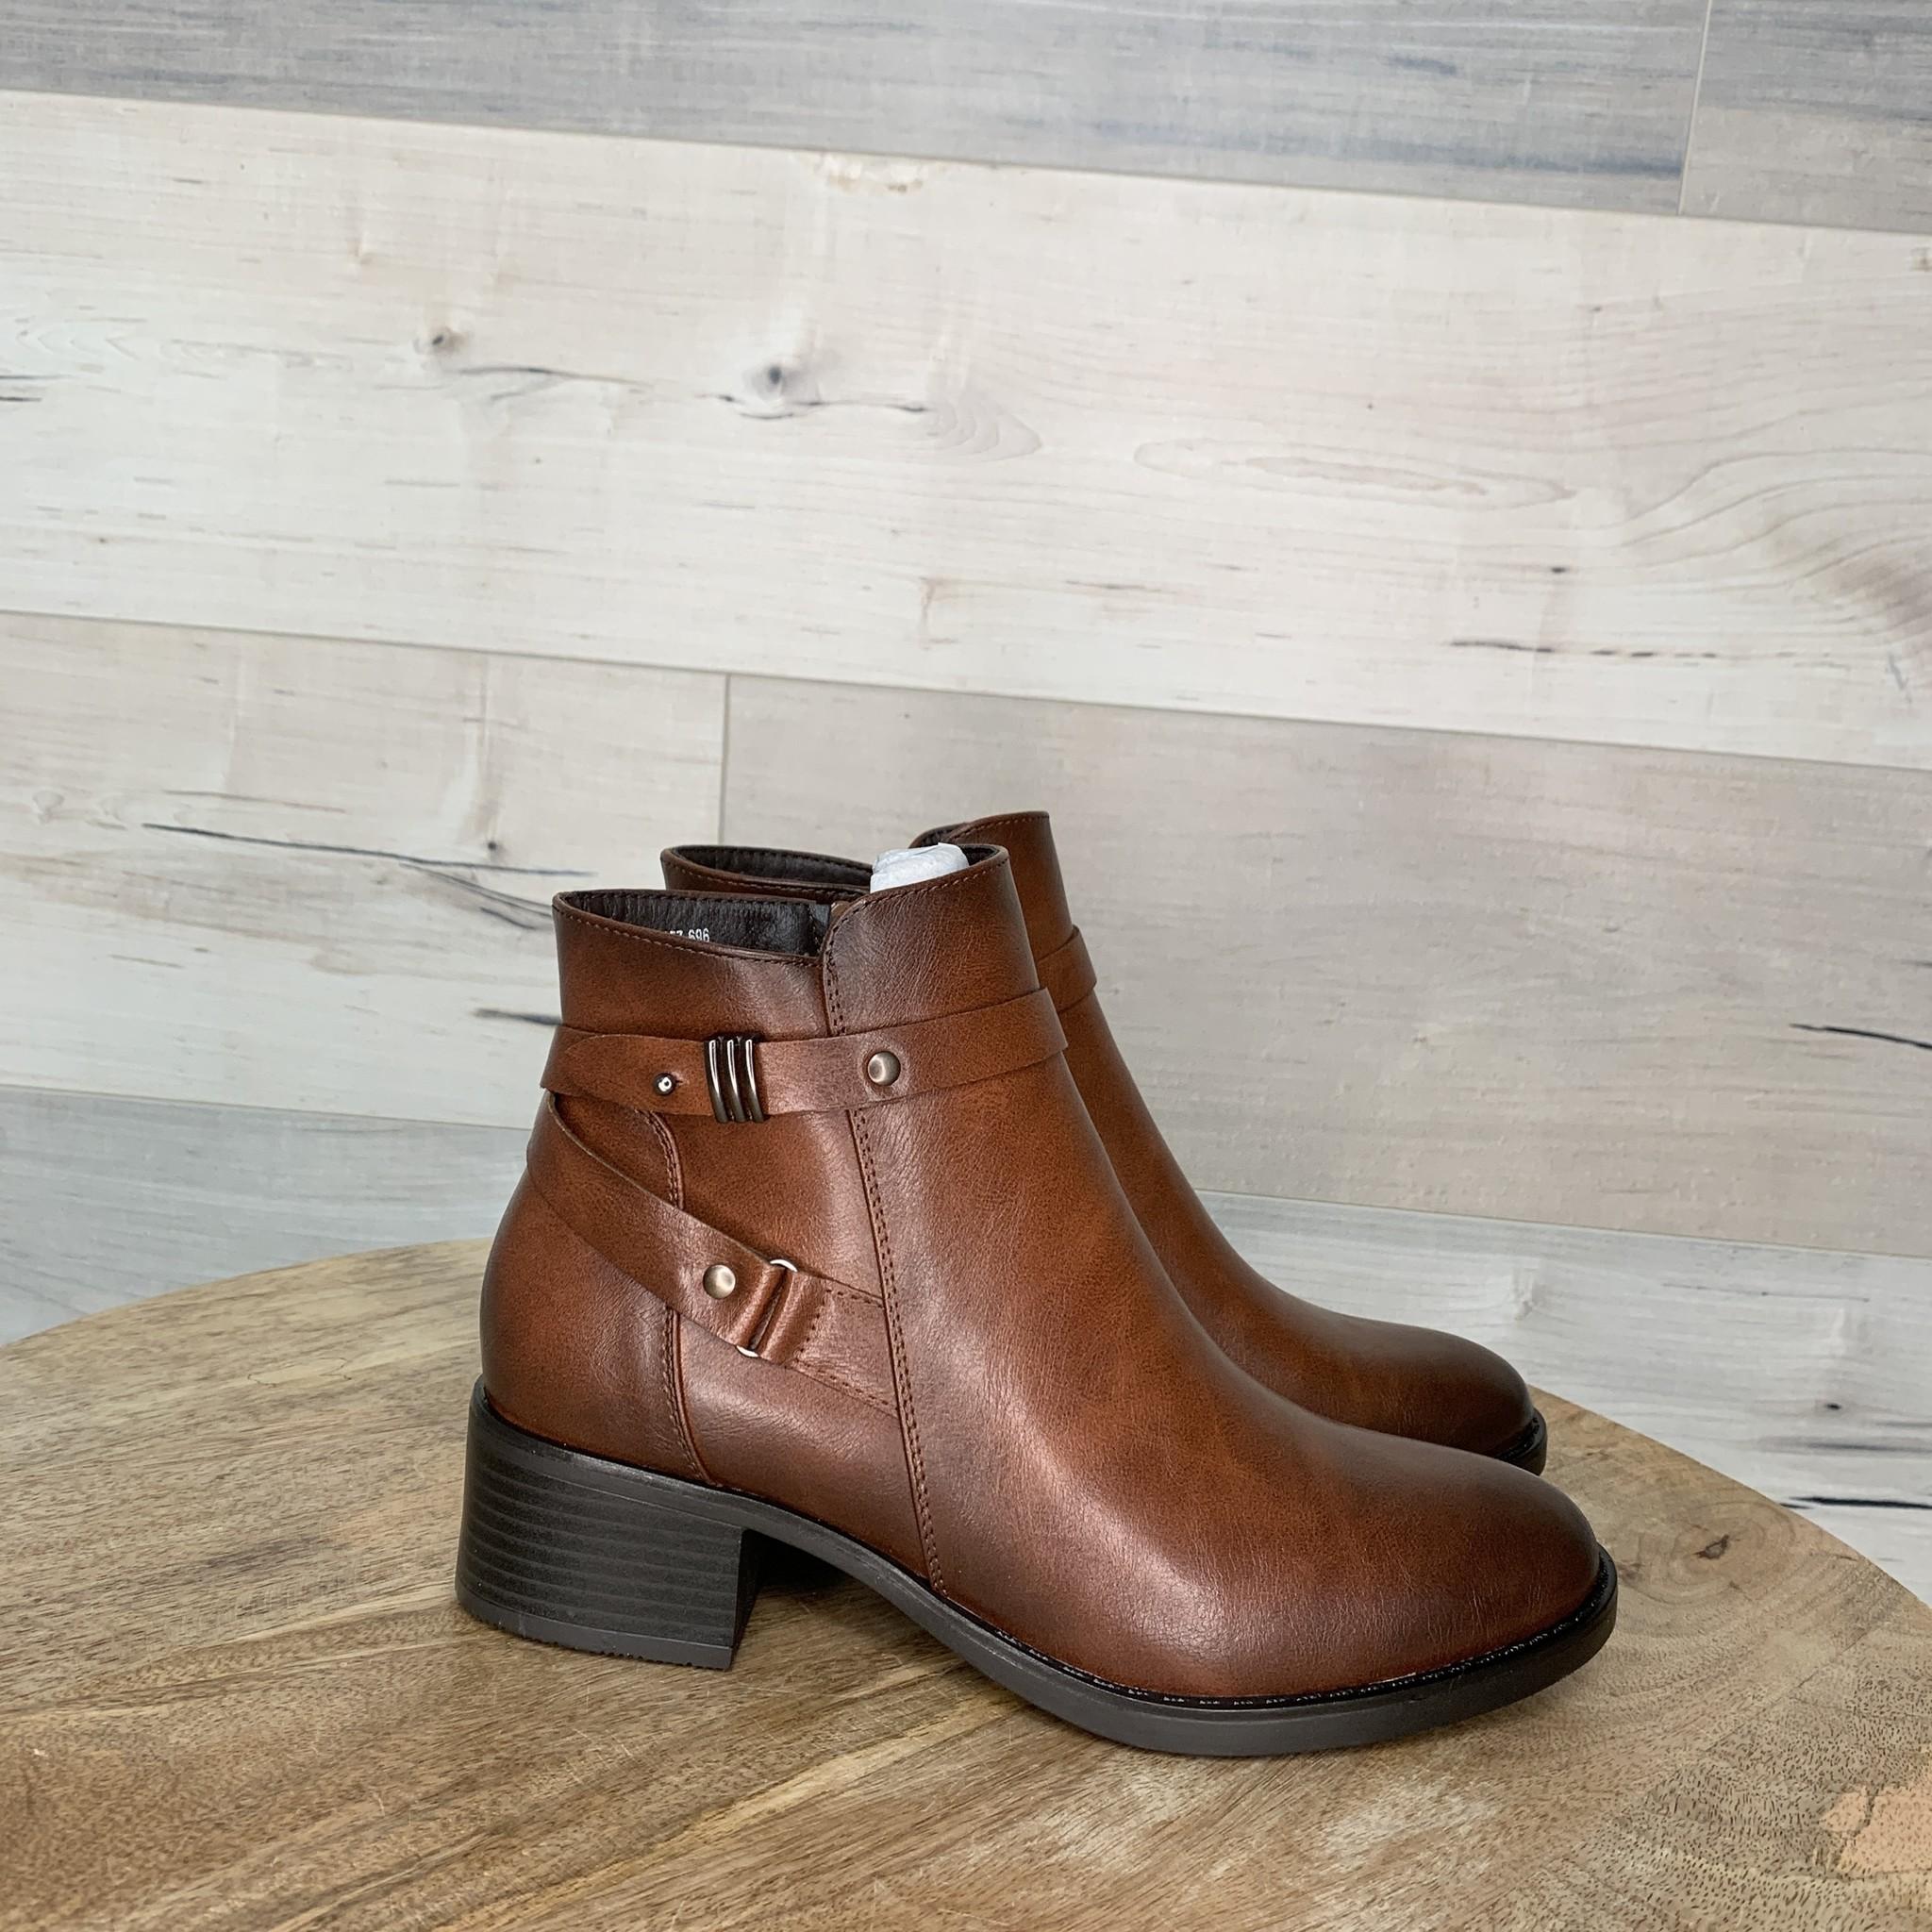 Benu Bootie - Brown